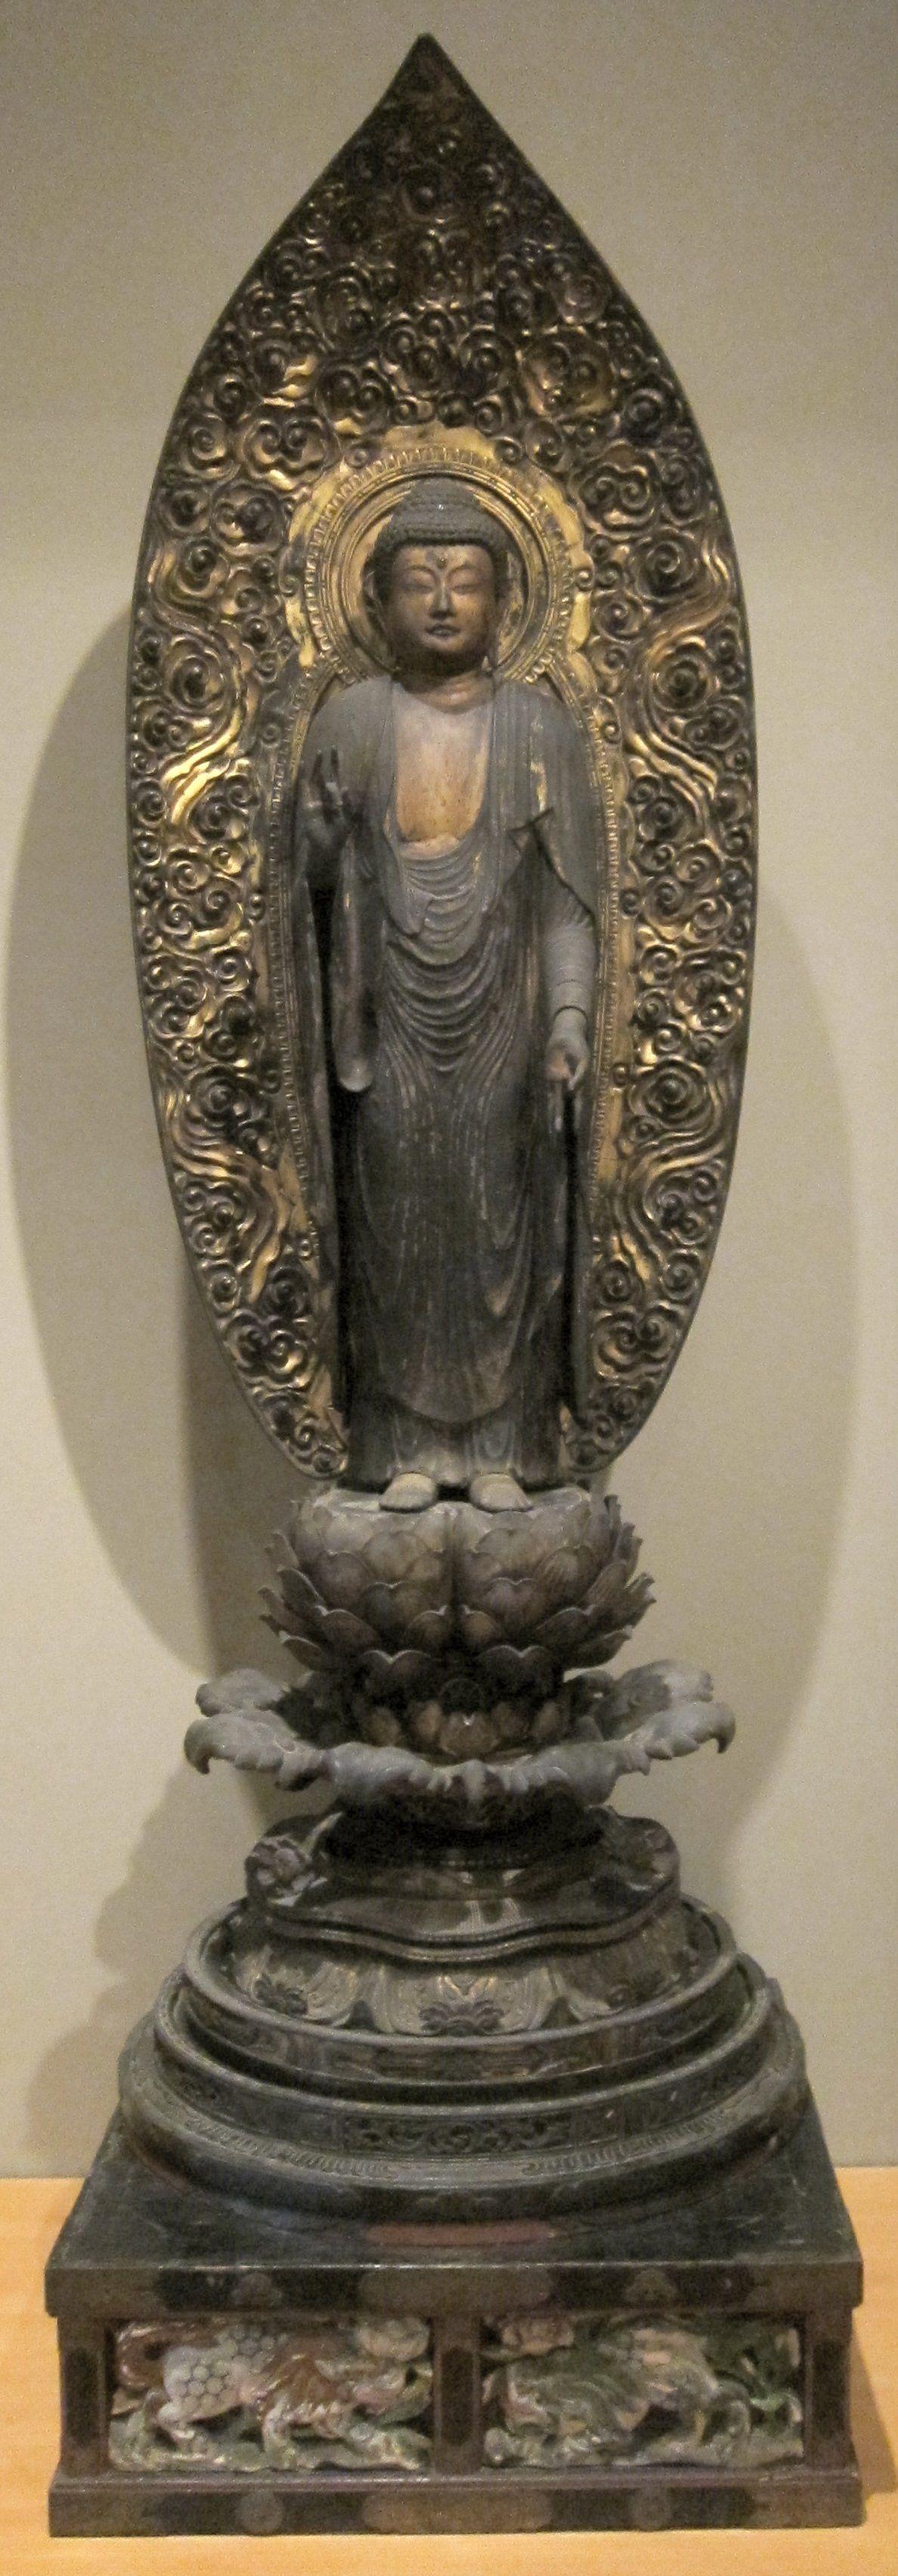 Amida,_Japan,_Muromachi_period,_15th_century,_wood_and_gold,_HAA.JPG (1188×3408)